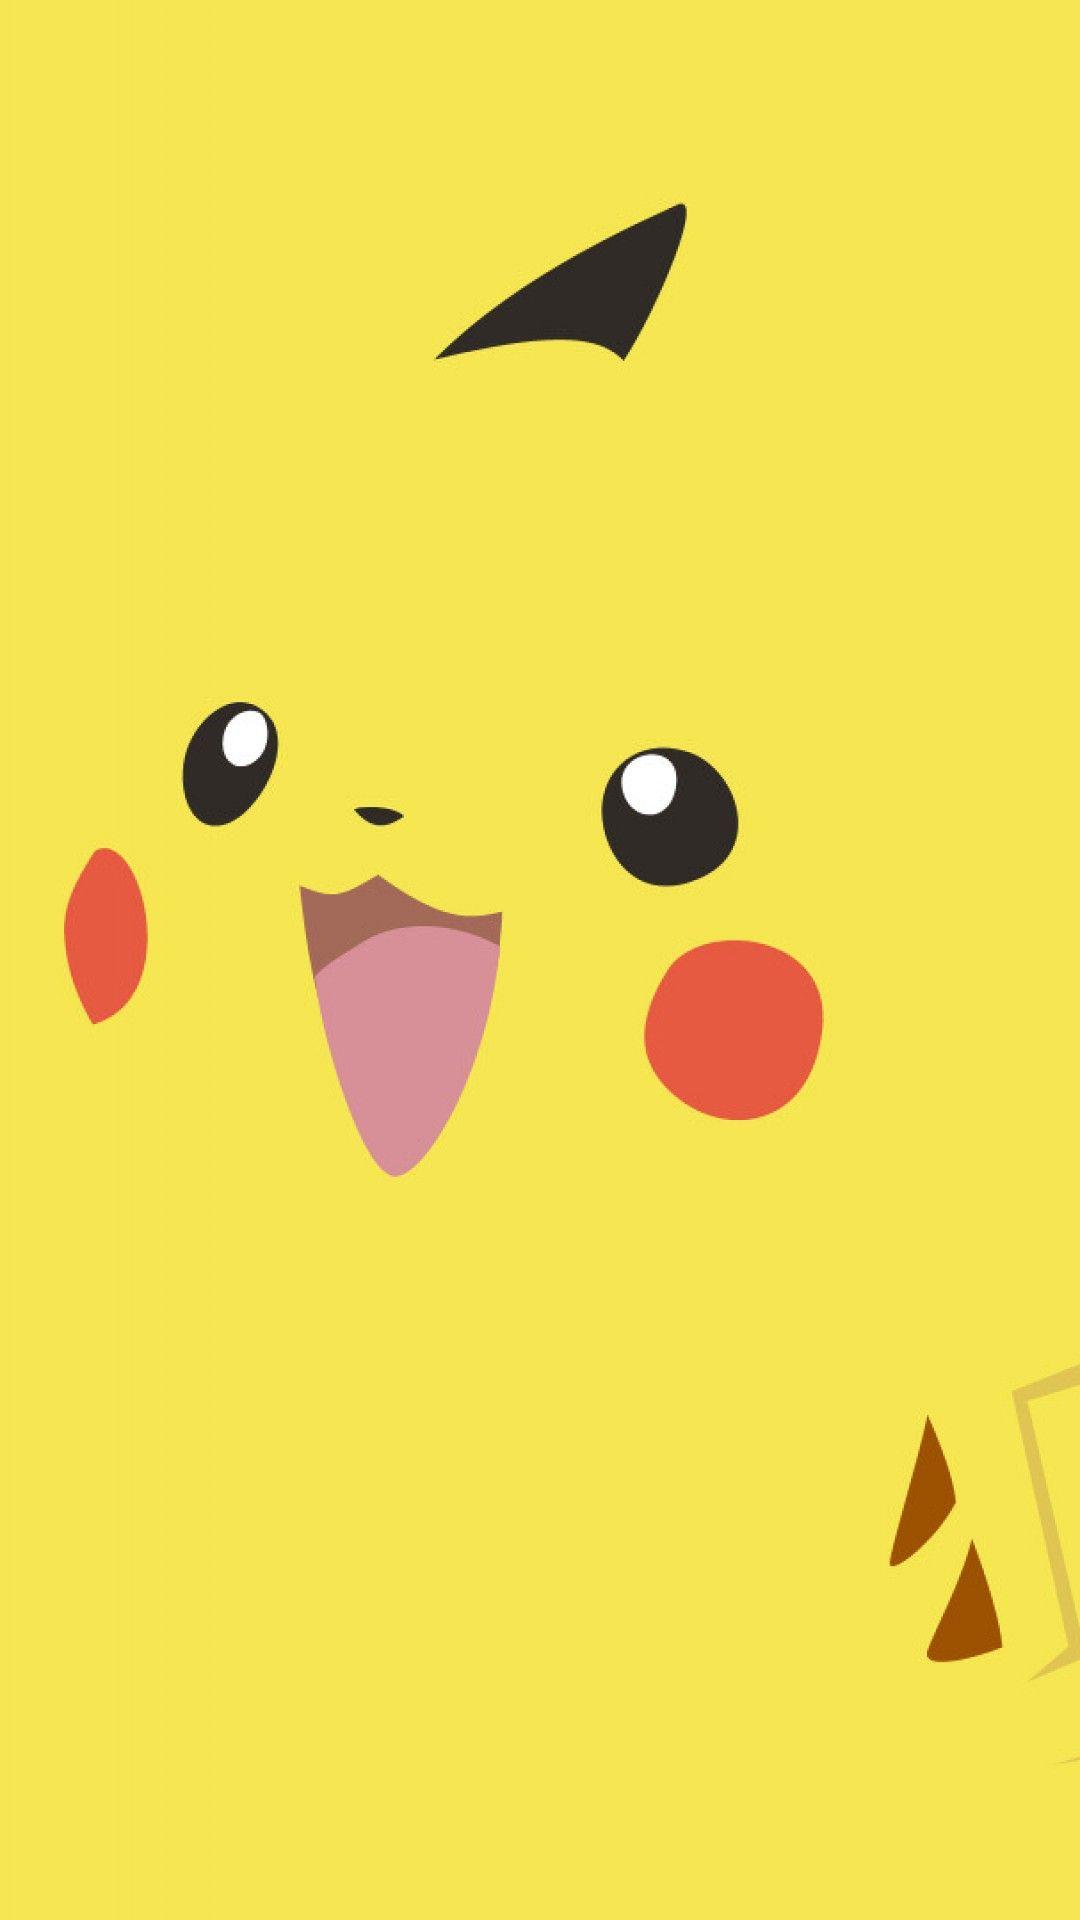 Pokemon Minimalist cool phone wallpaper